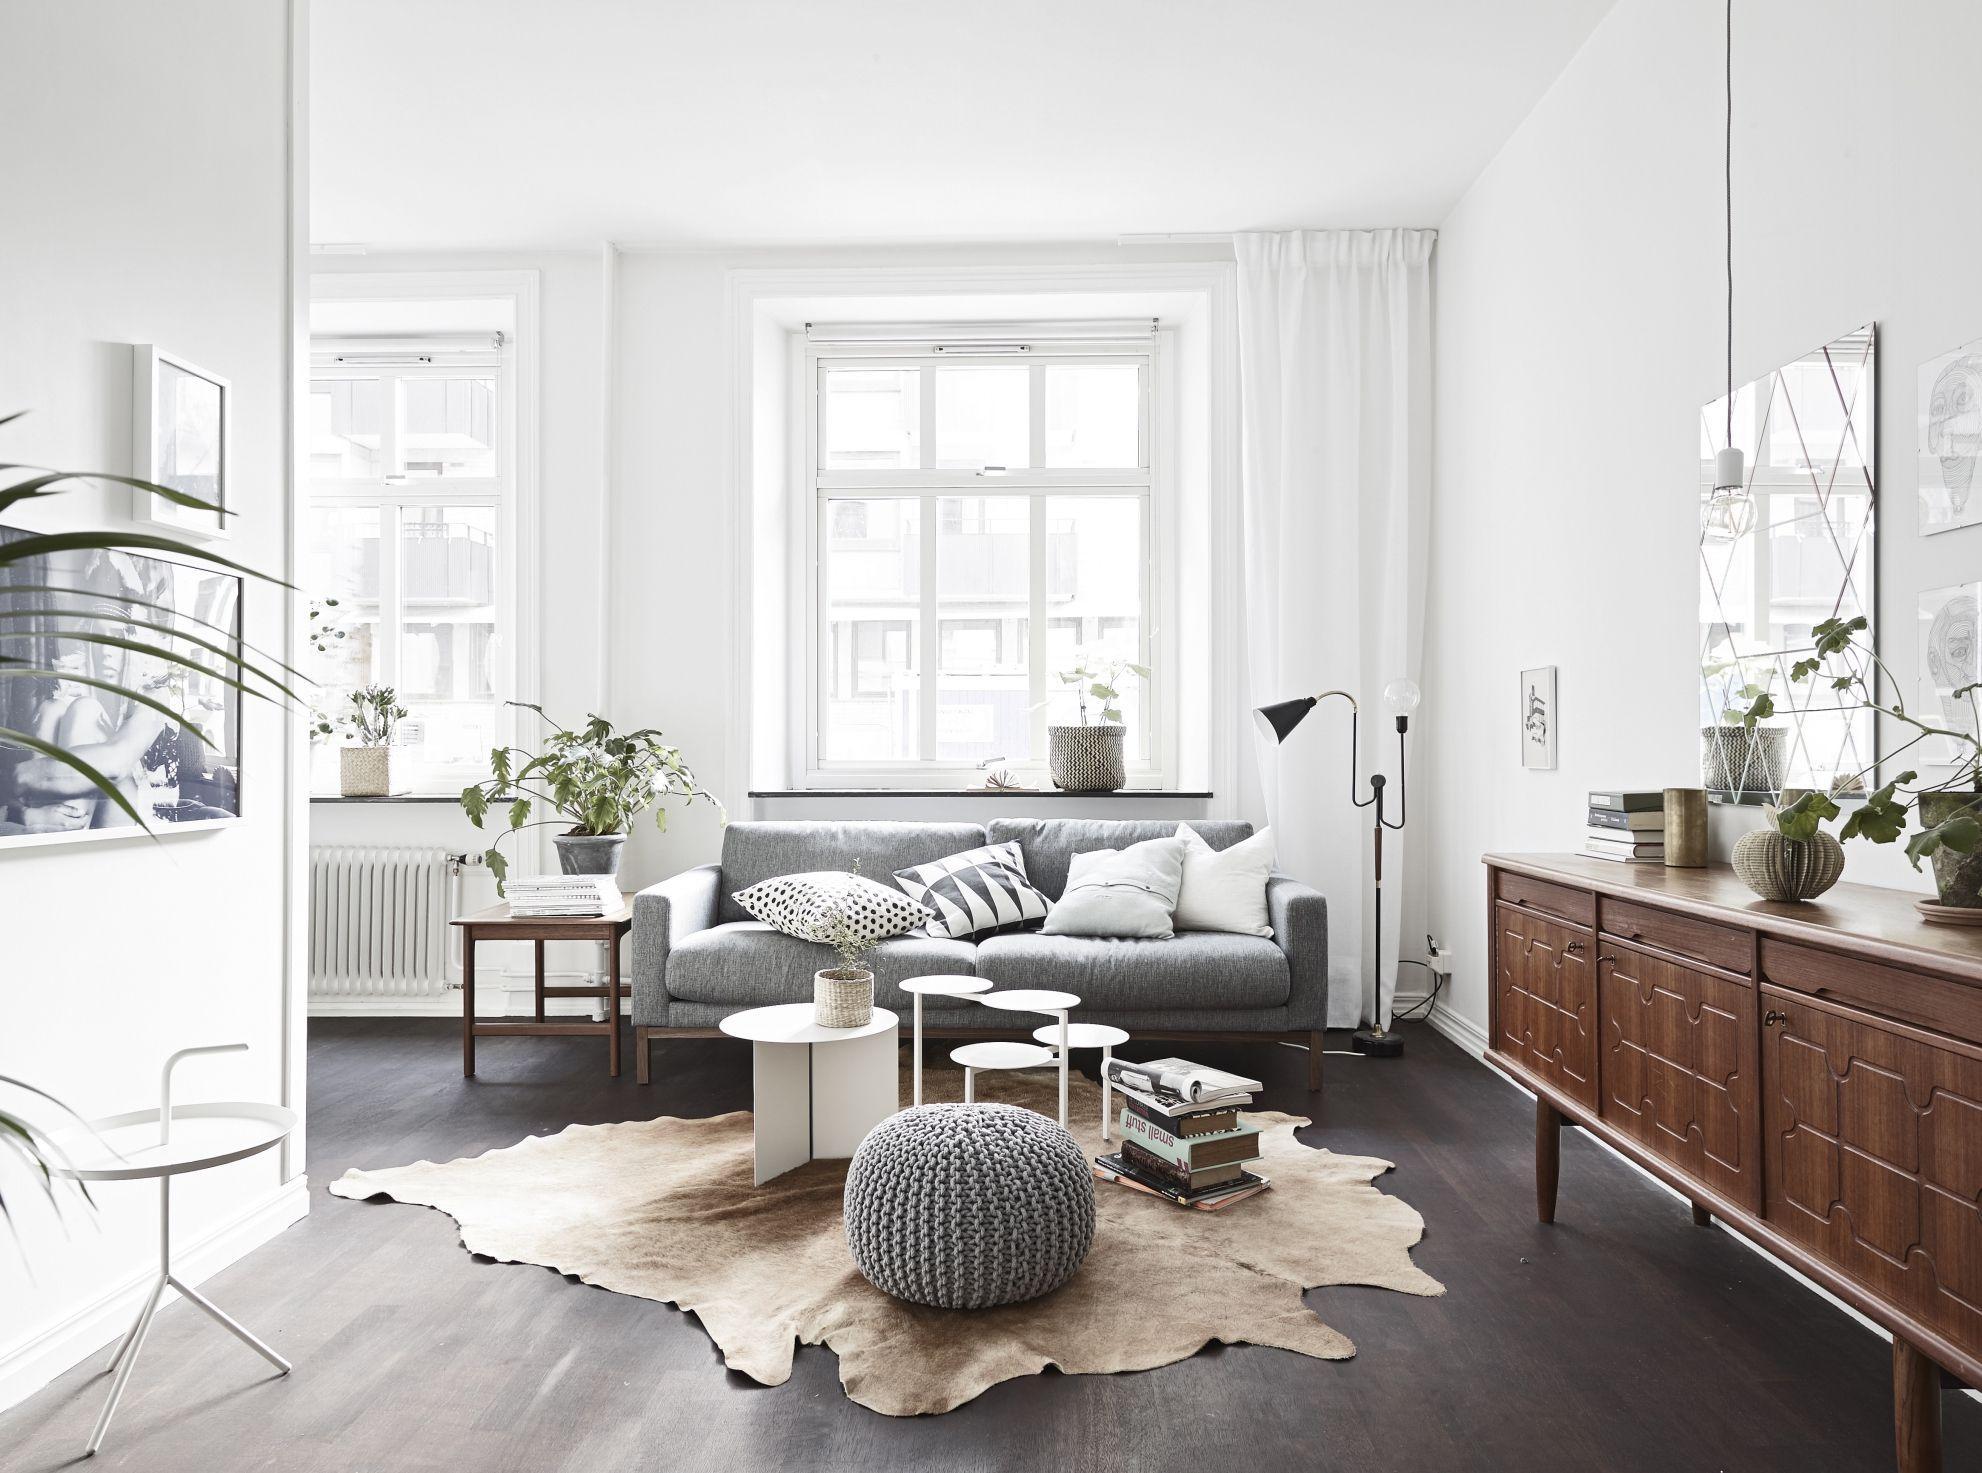 deco appartement style scandinave design scandinave. Black Bedroom Furniture Sets. Home Design Ideas